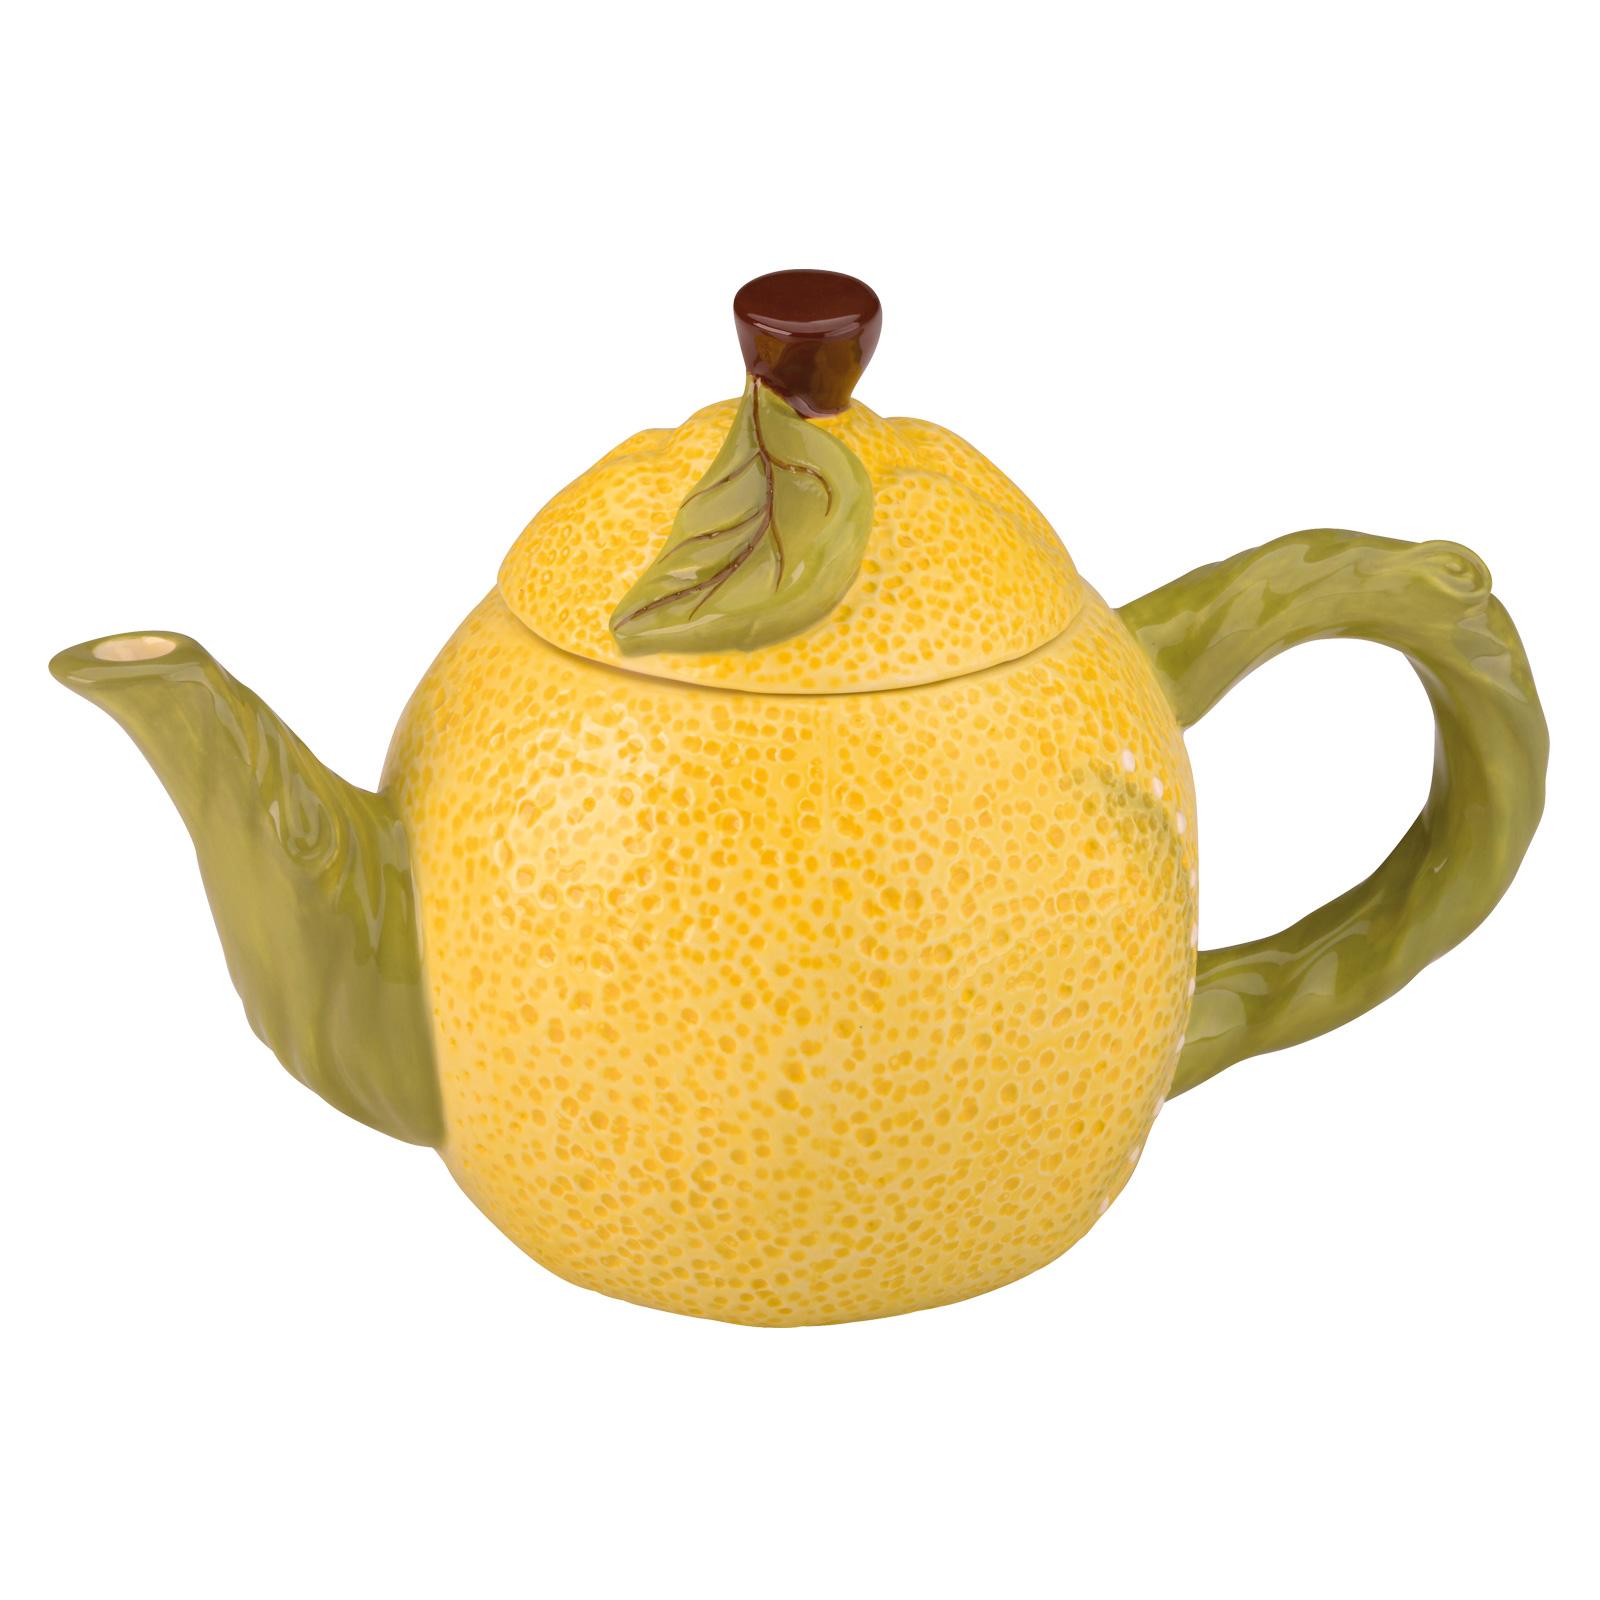 Sorrento Teapot by BIA